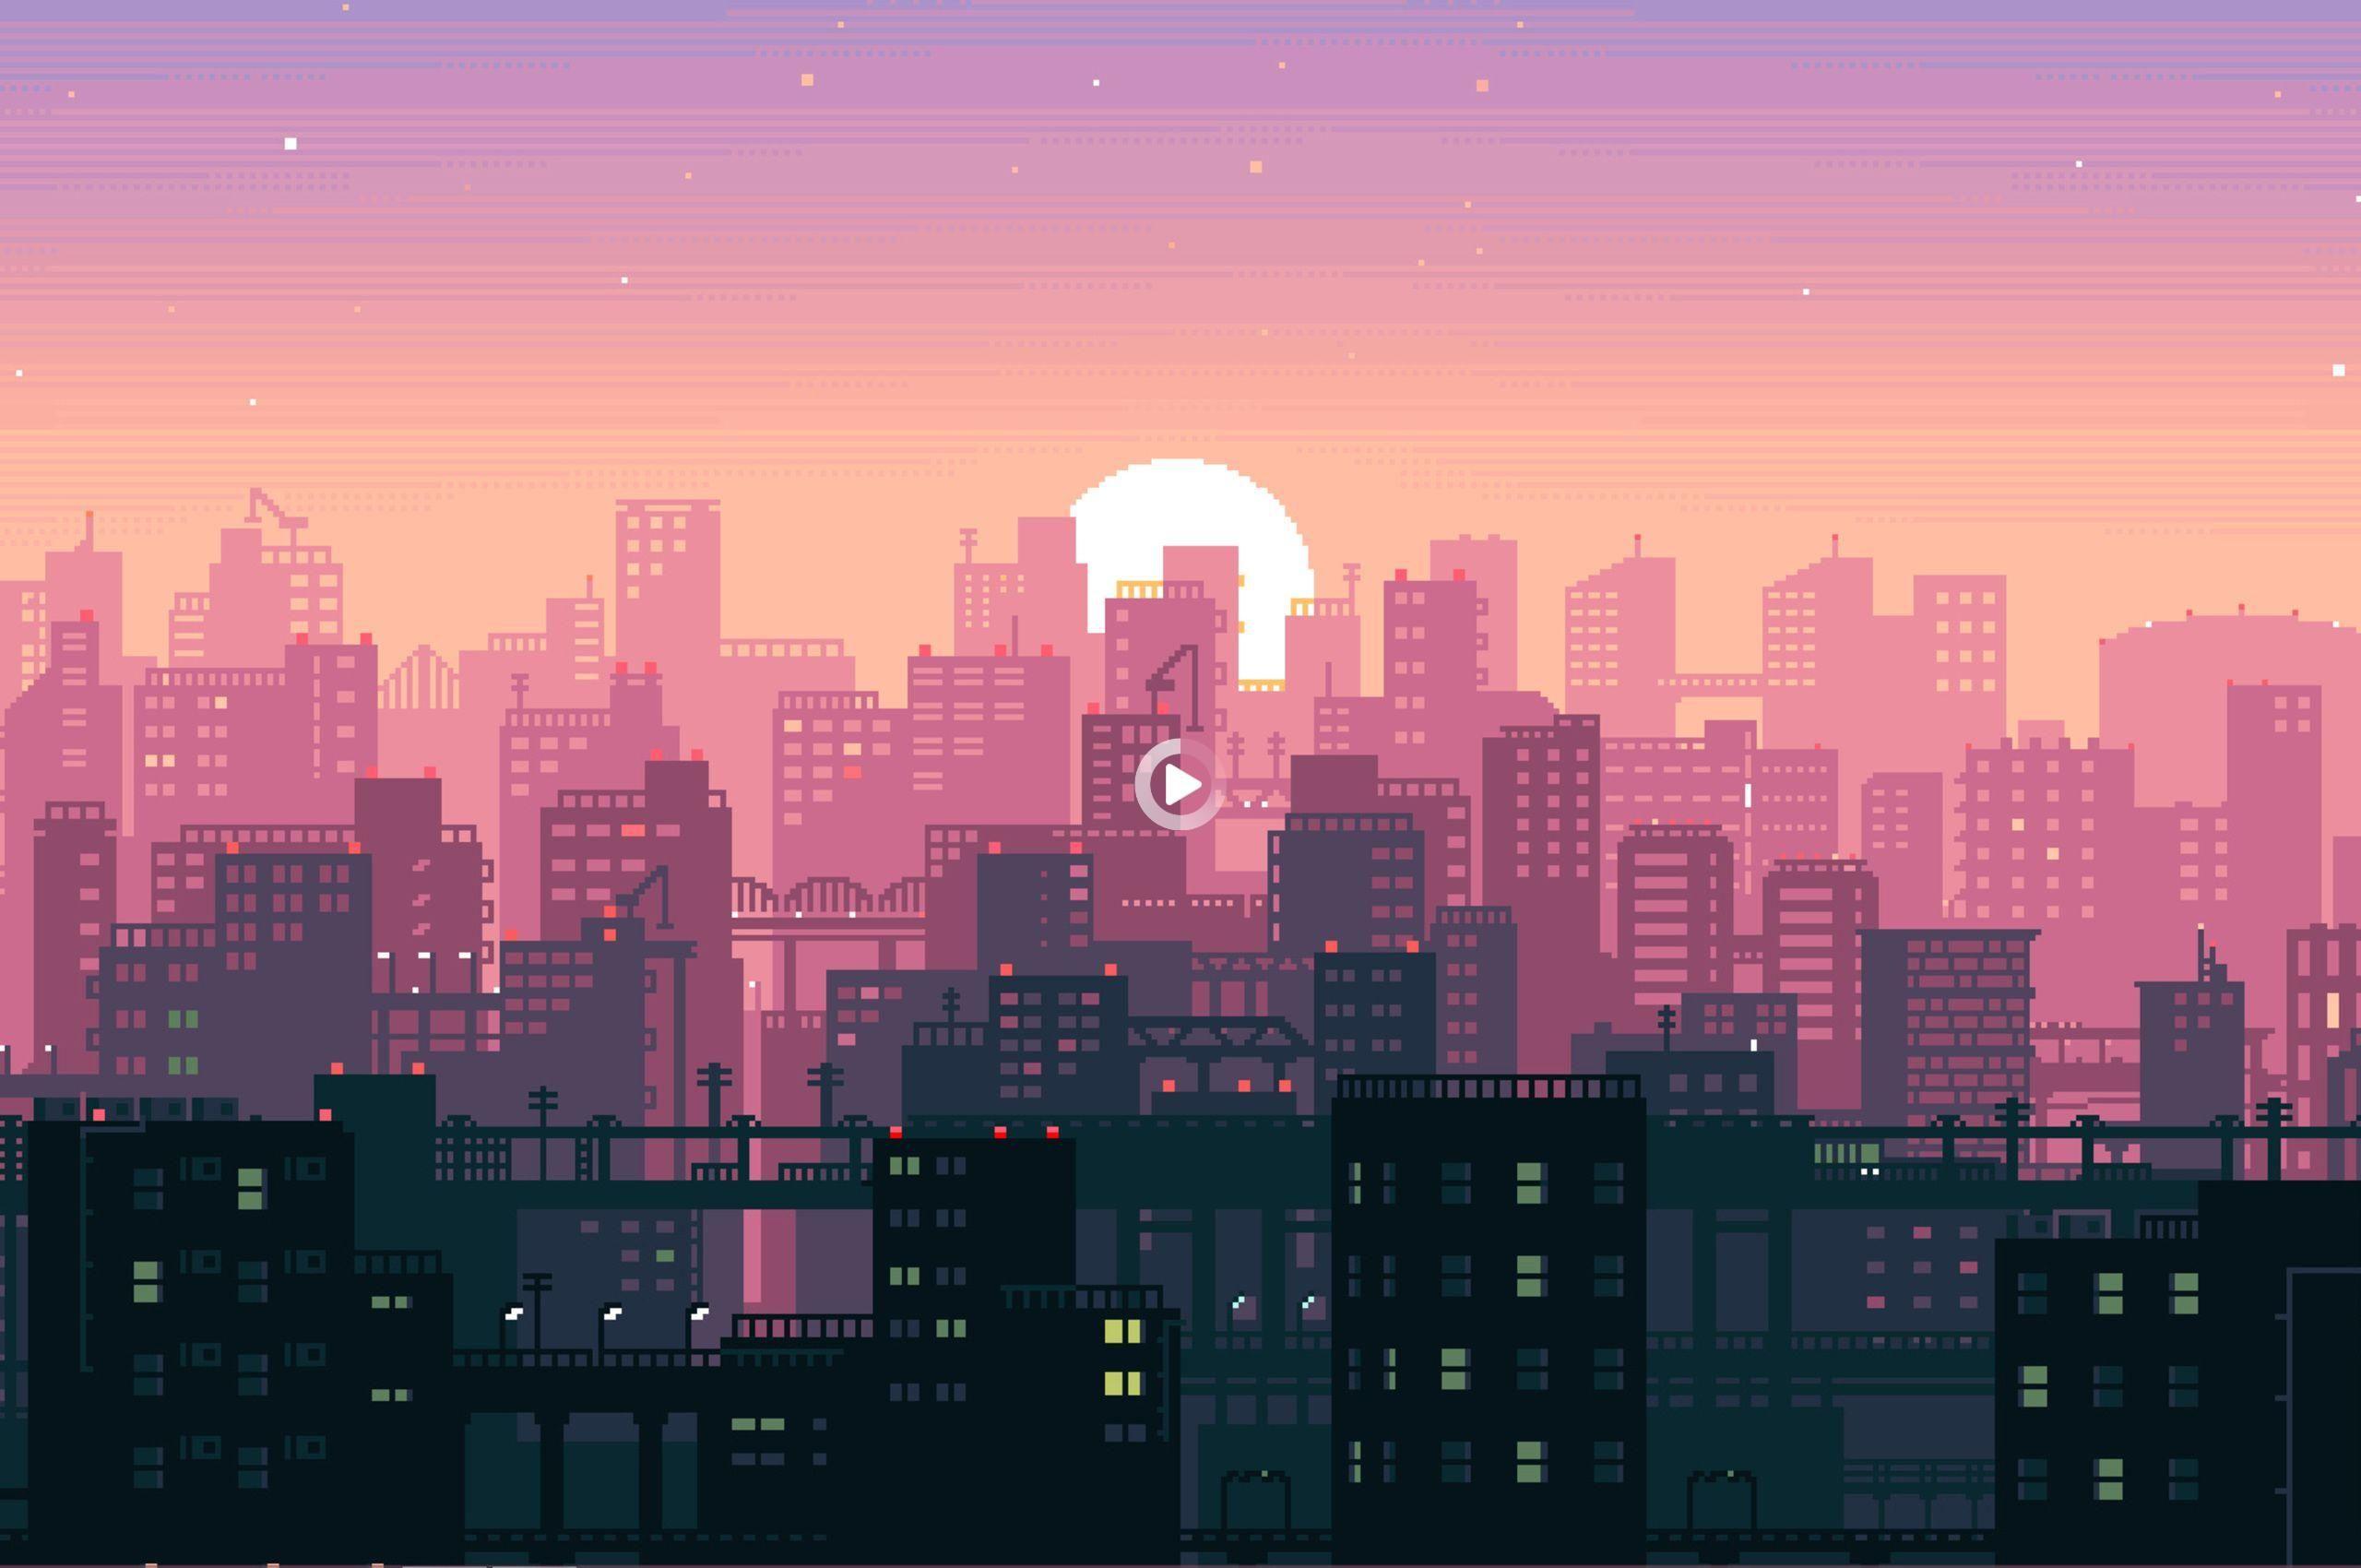 8 Bit Sunset Aesthetic Wallpaper Gif Pixel Art Background Building Illustration